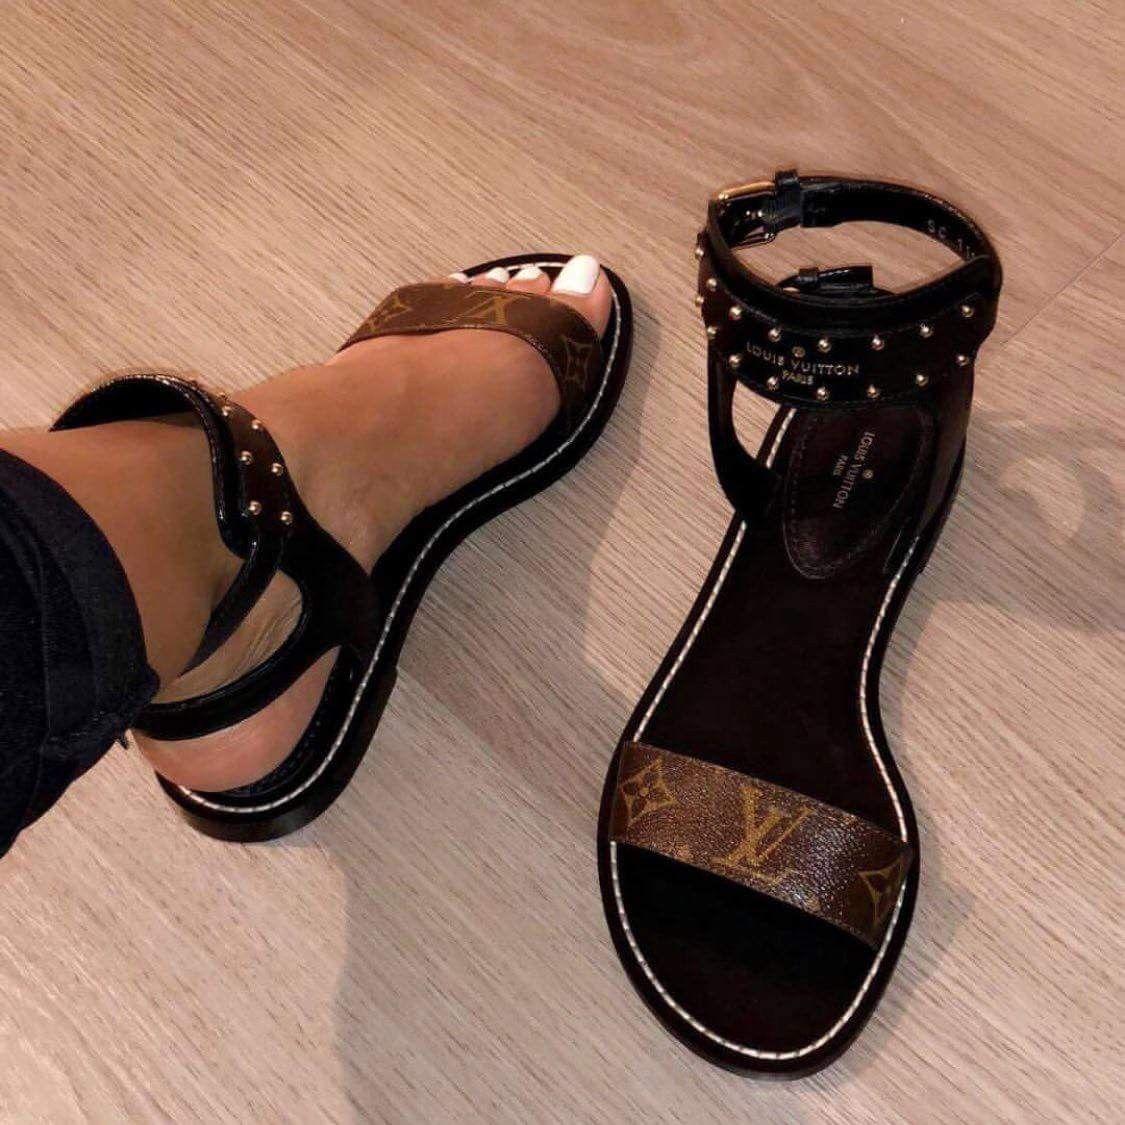 09844a94728a Hokus Pokus DSW Black Elastic Gladiator Sandals Black gladiator sandals.  Gently…